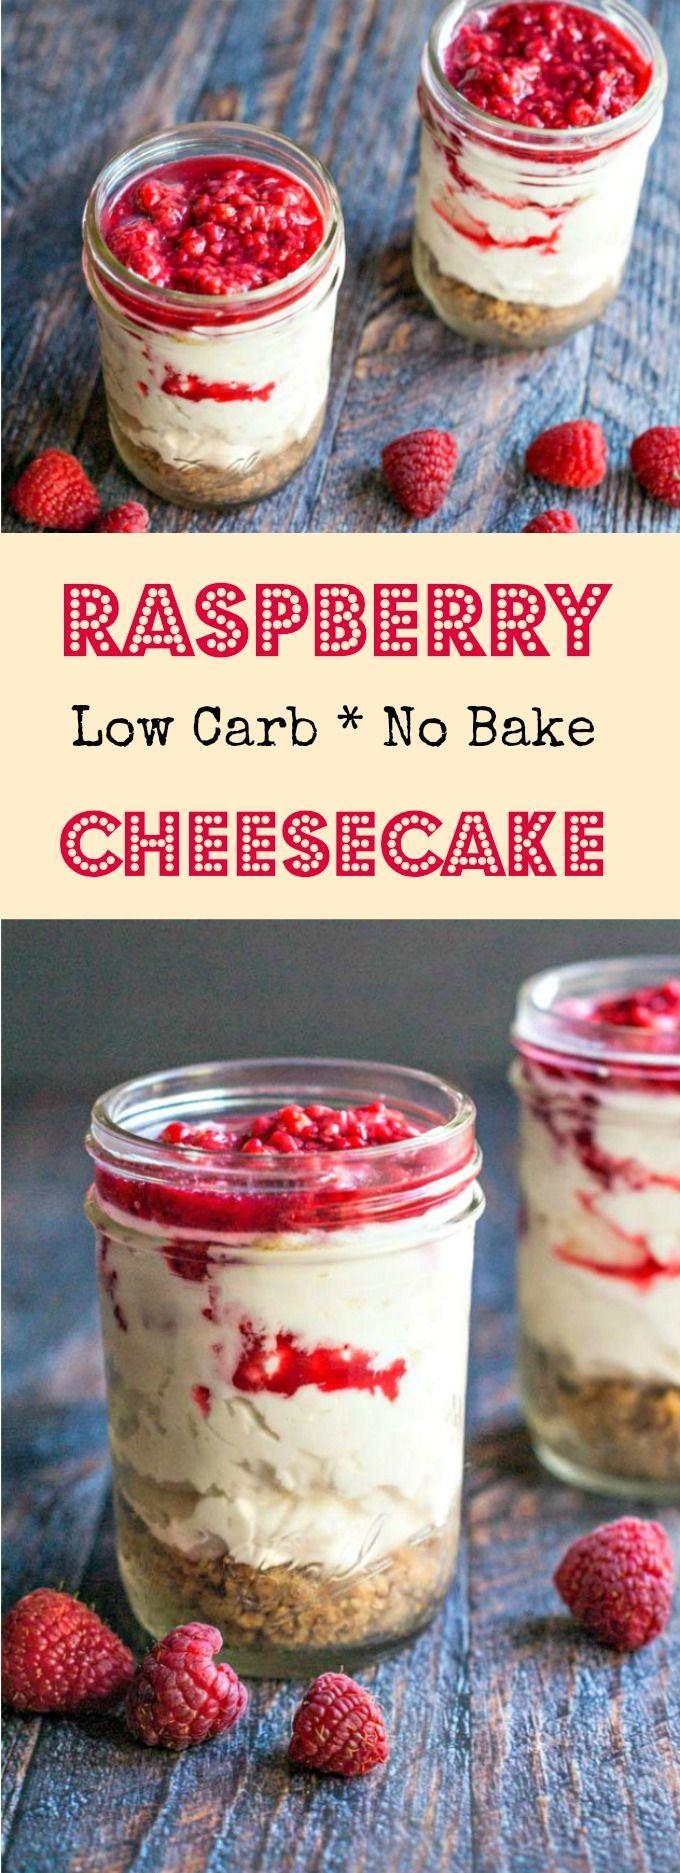 Pinterest Raspberry Recipe Image